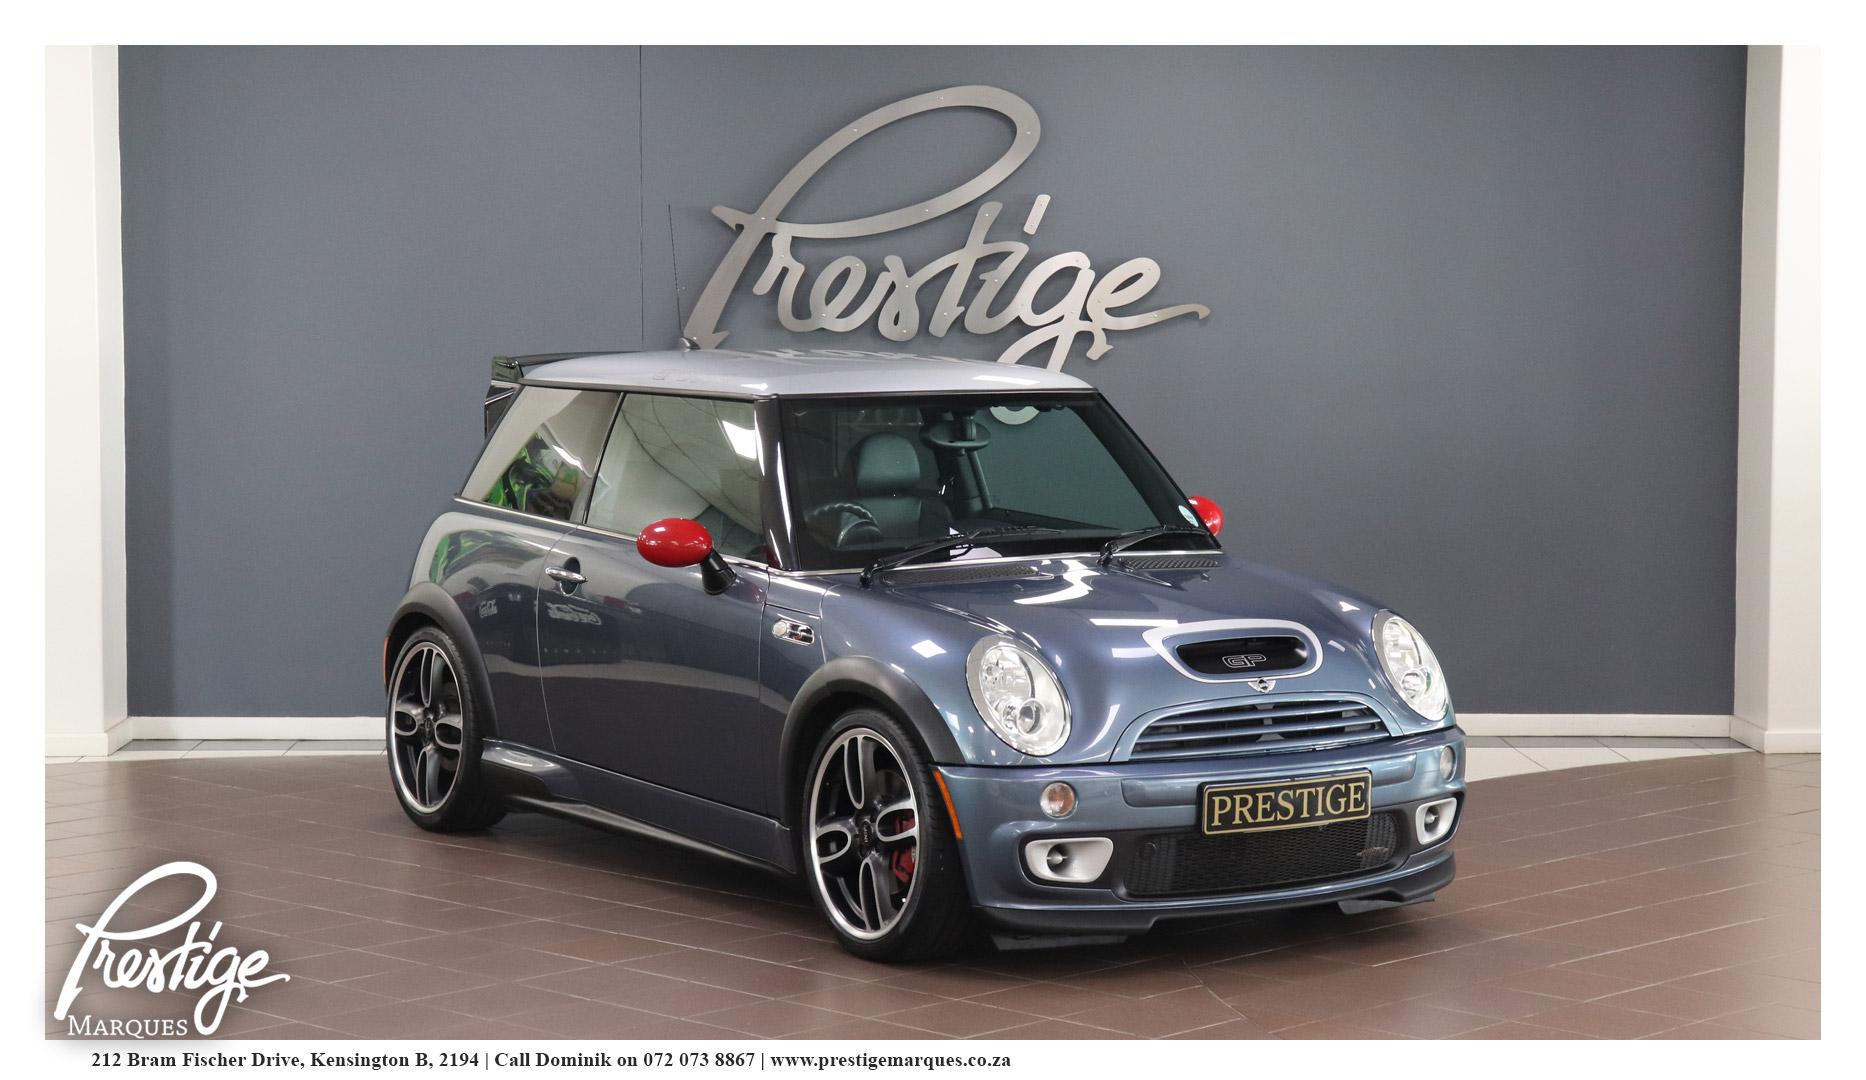 2006-Mini-Cooper-S-GP-Johon-Cooper-Works- Prestige-Marques-Randburg-Sandton-1